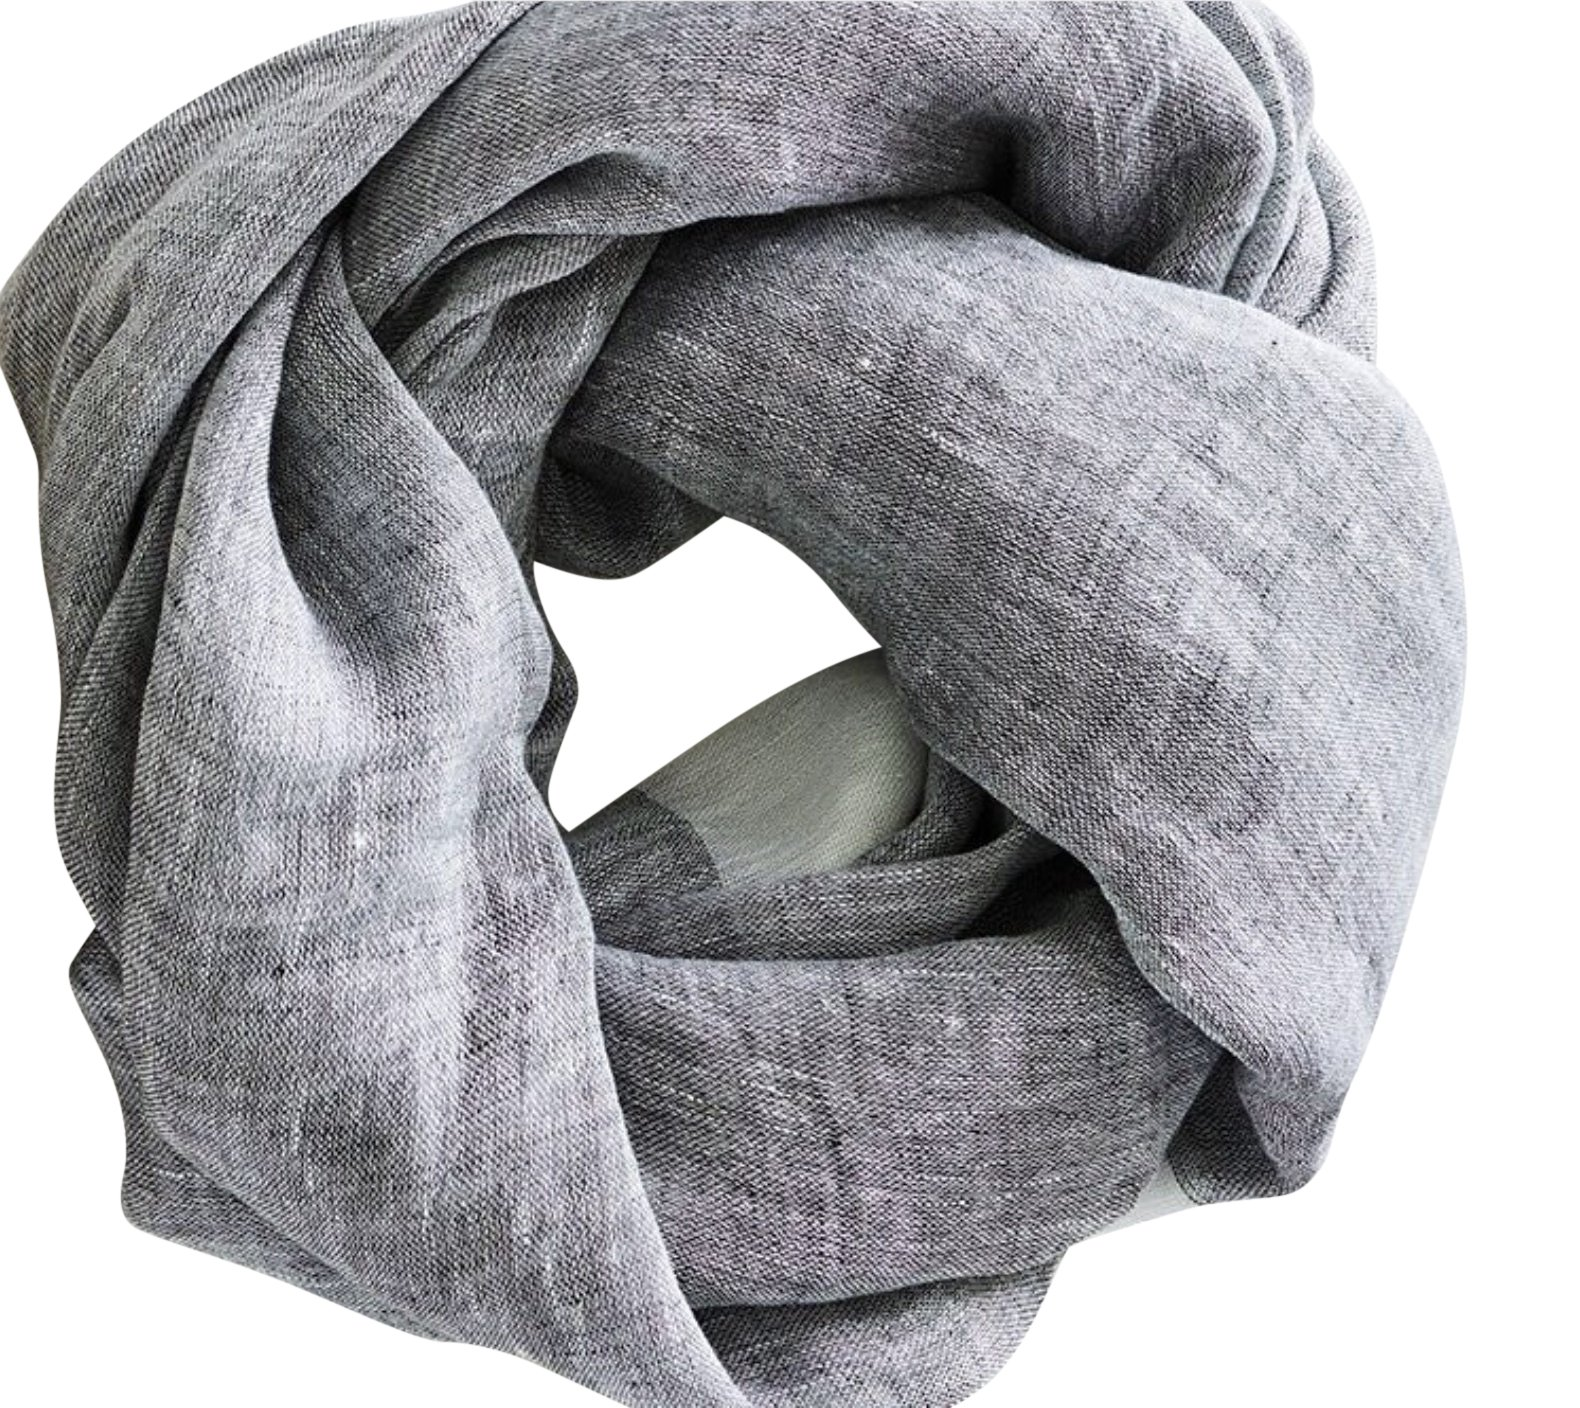 Mersea Linen Travel Wrap Noir (Almost Black)